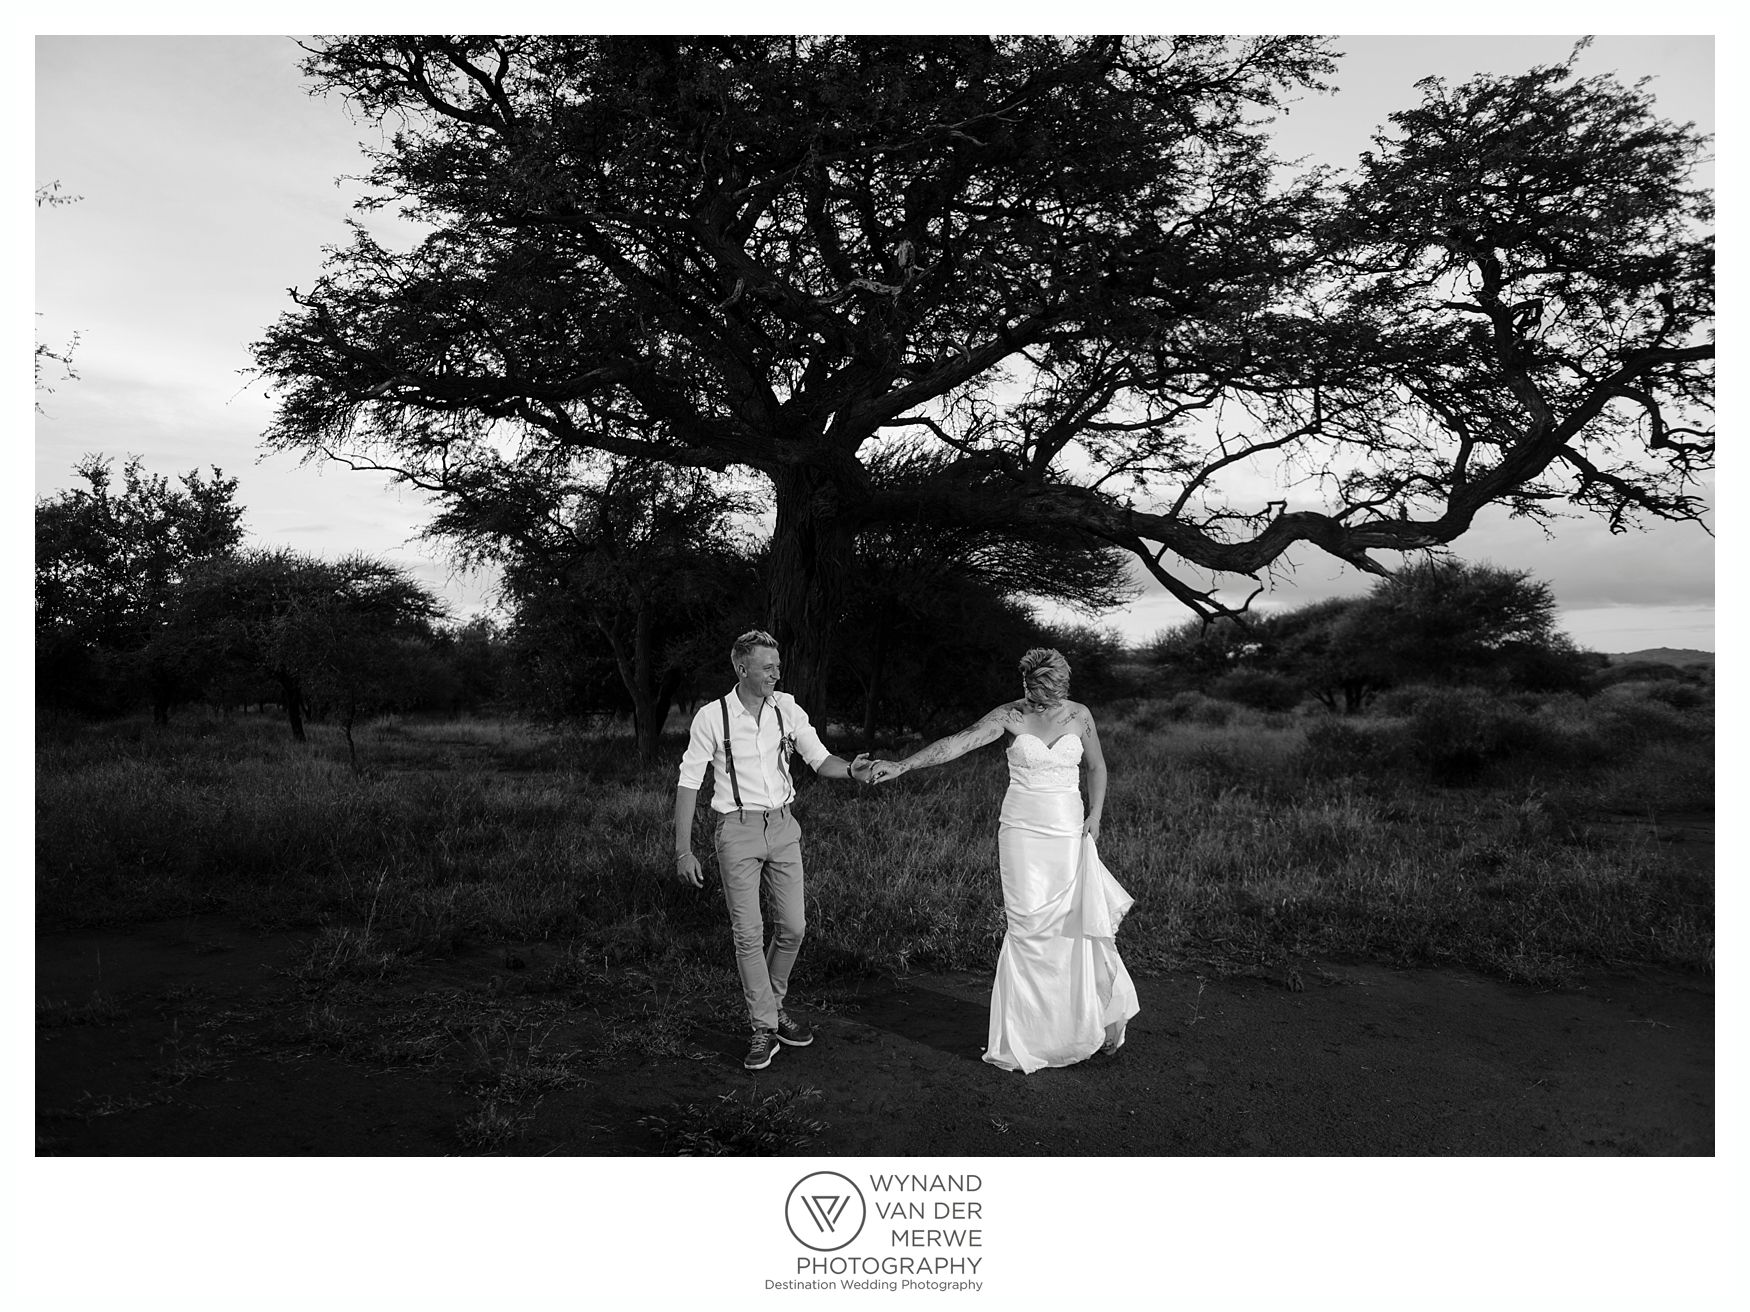 WynandvanderMerwe_weddingphotography_bushveldwedding_northam_bushveld_limpopowedding_limpopo_southafrica-288.jpg